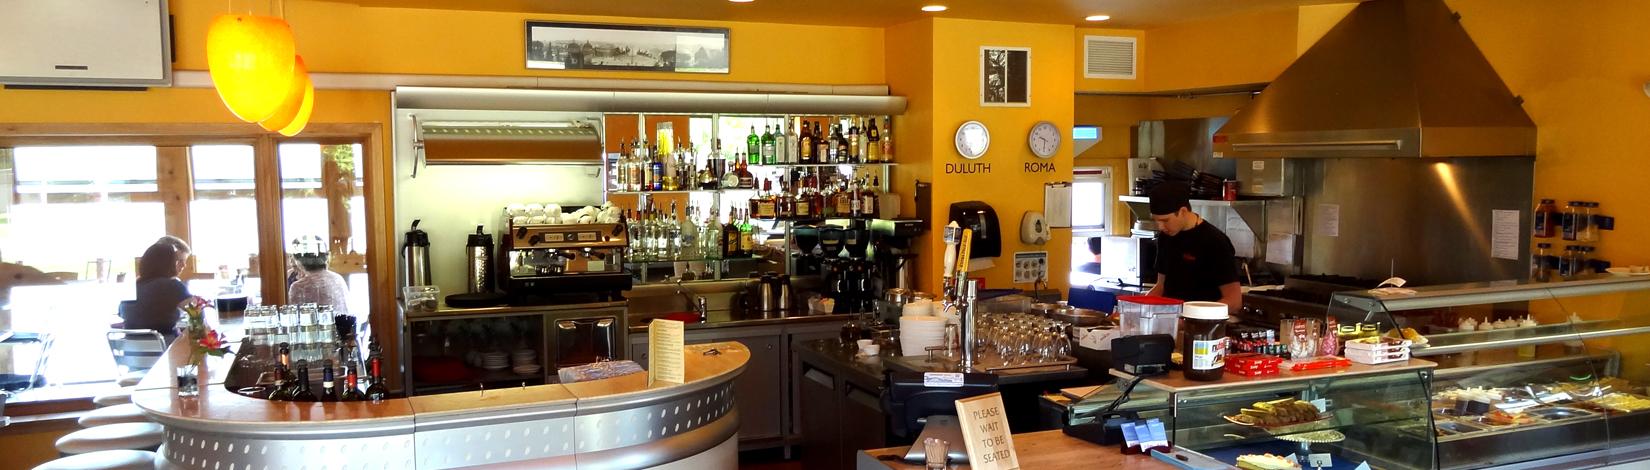 JJ Astor Restaurant amp Lounge Duluth  Restaurant Reviews